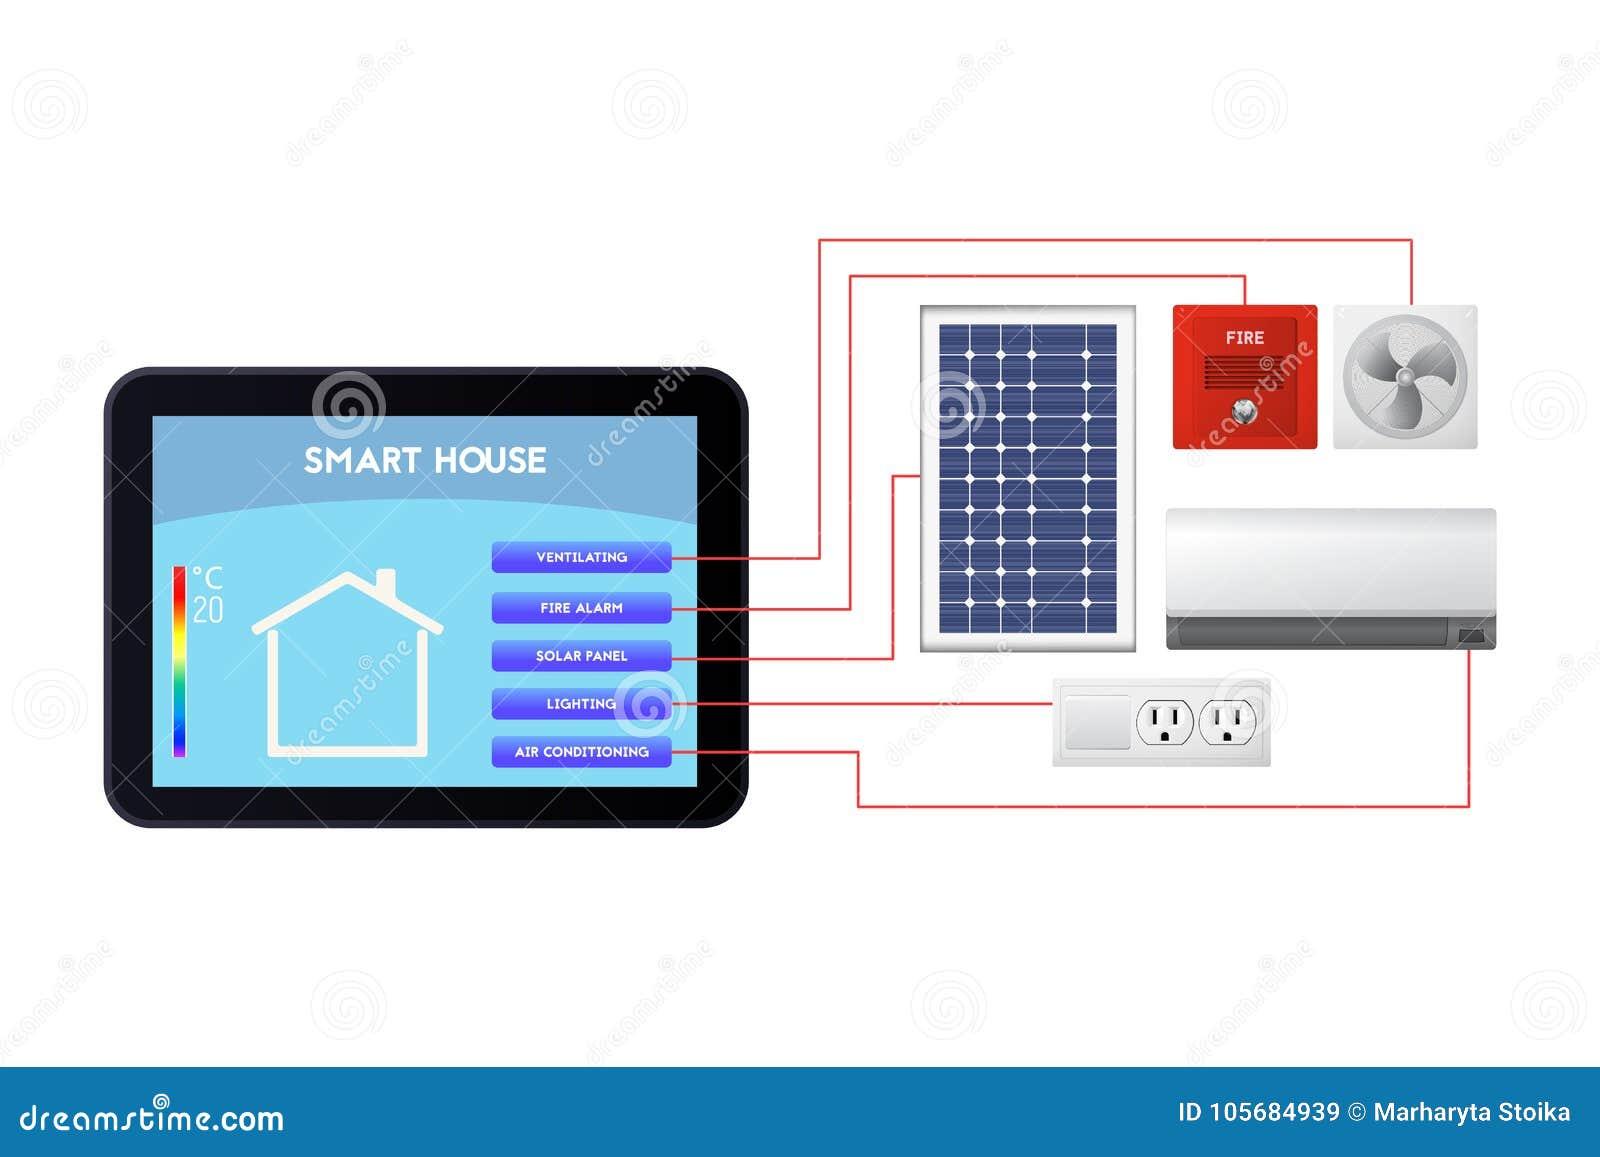 Smart House Administration. Ventilation, Fire Alarm, Solar Panel ...